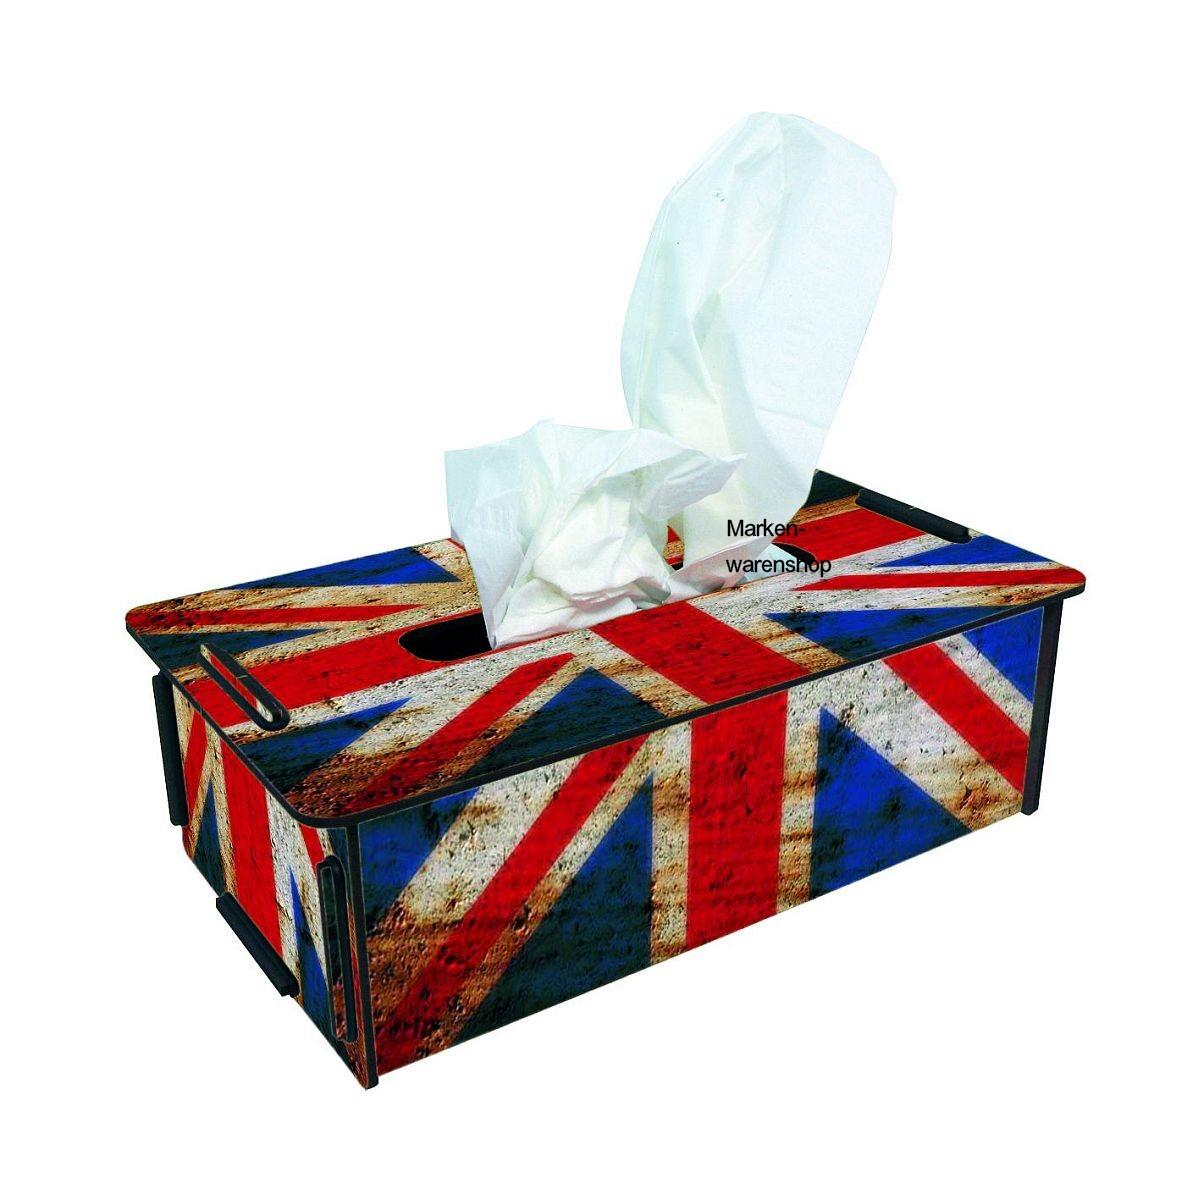 werkhaus t cherbox flagge england tissue box. Black Bedroom Furniture Sets. Home Design Ideas